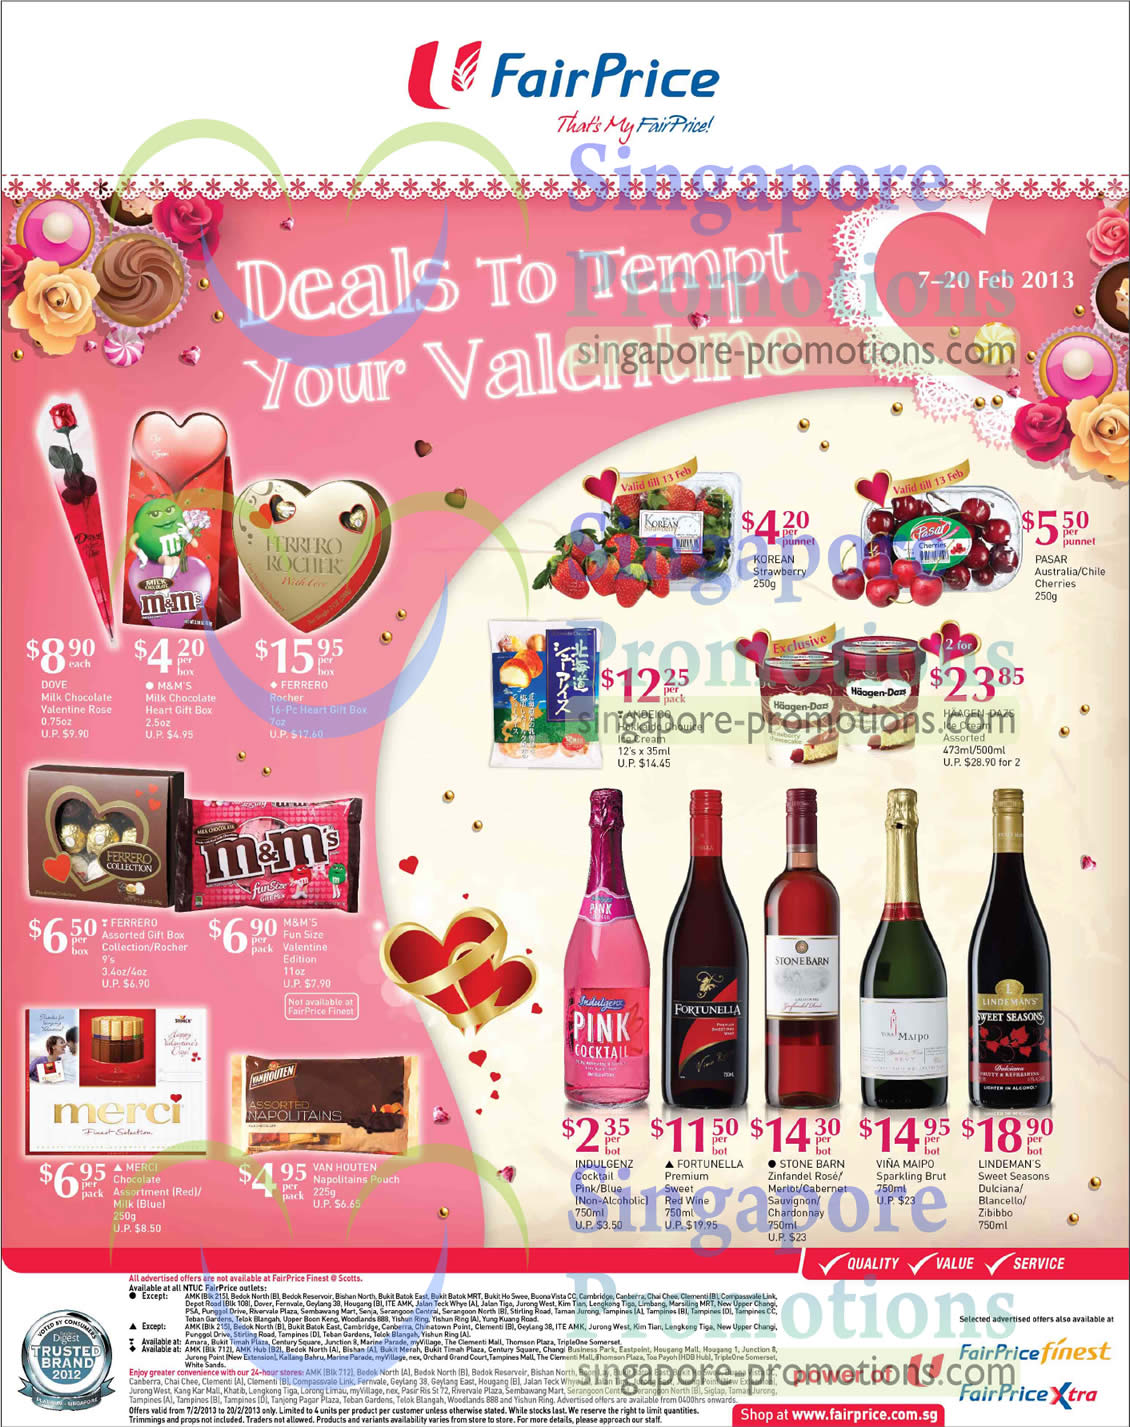 FORTUNELLA Premium Sweet Red Wine, STONE BARN Zinfandel Rose, STONE BARN Merlot, STONE BARN Cabernet Sauvignon , STONE BARN Chardonna, VINA MAIPO Sparkling Brut, LINDEMAN'S Sweet Seasons Dulciana, LINDEMAN'S Blancello, LINDEMAN'S Zibibbo